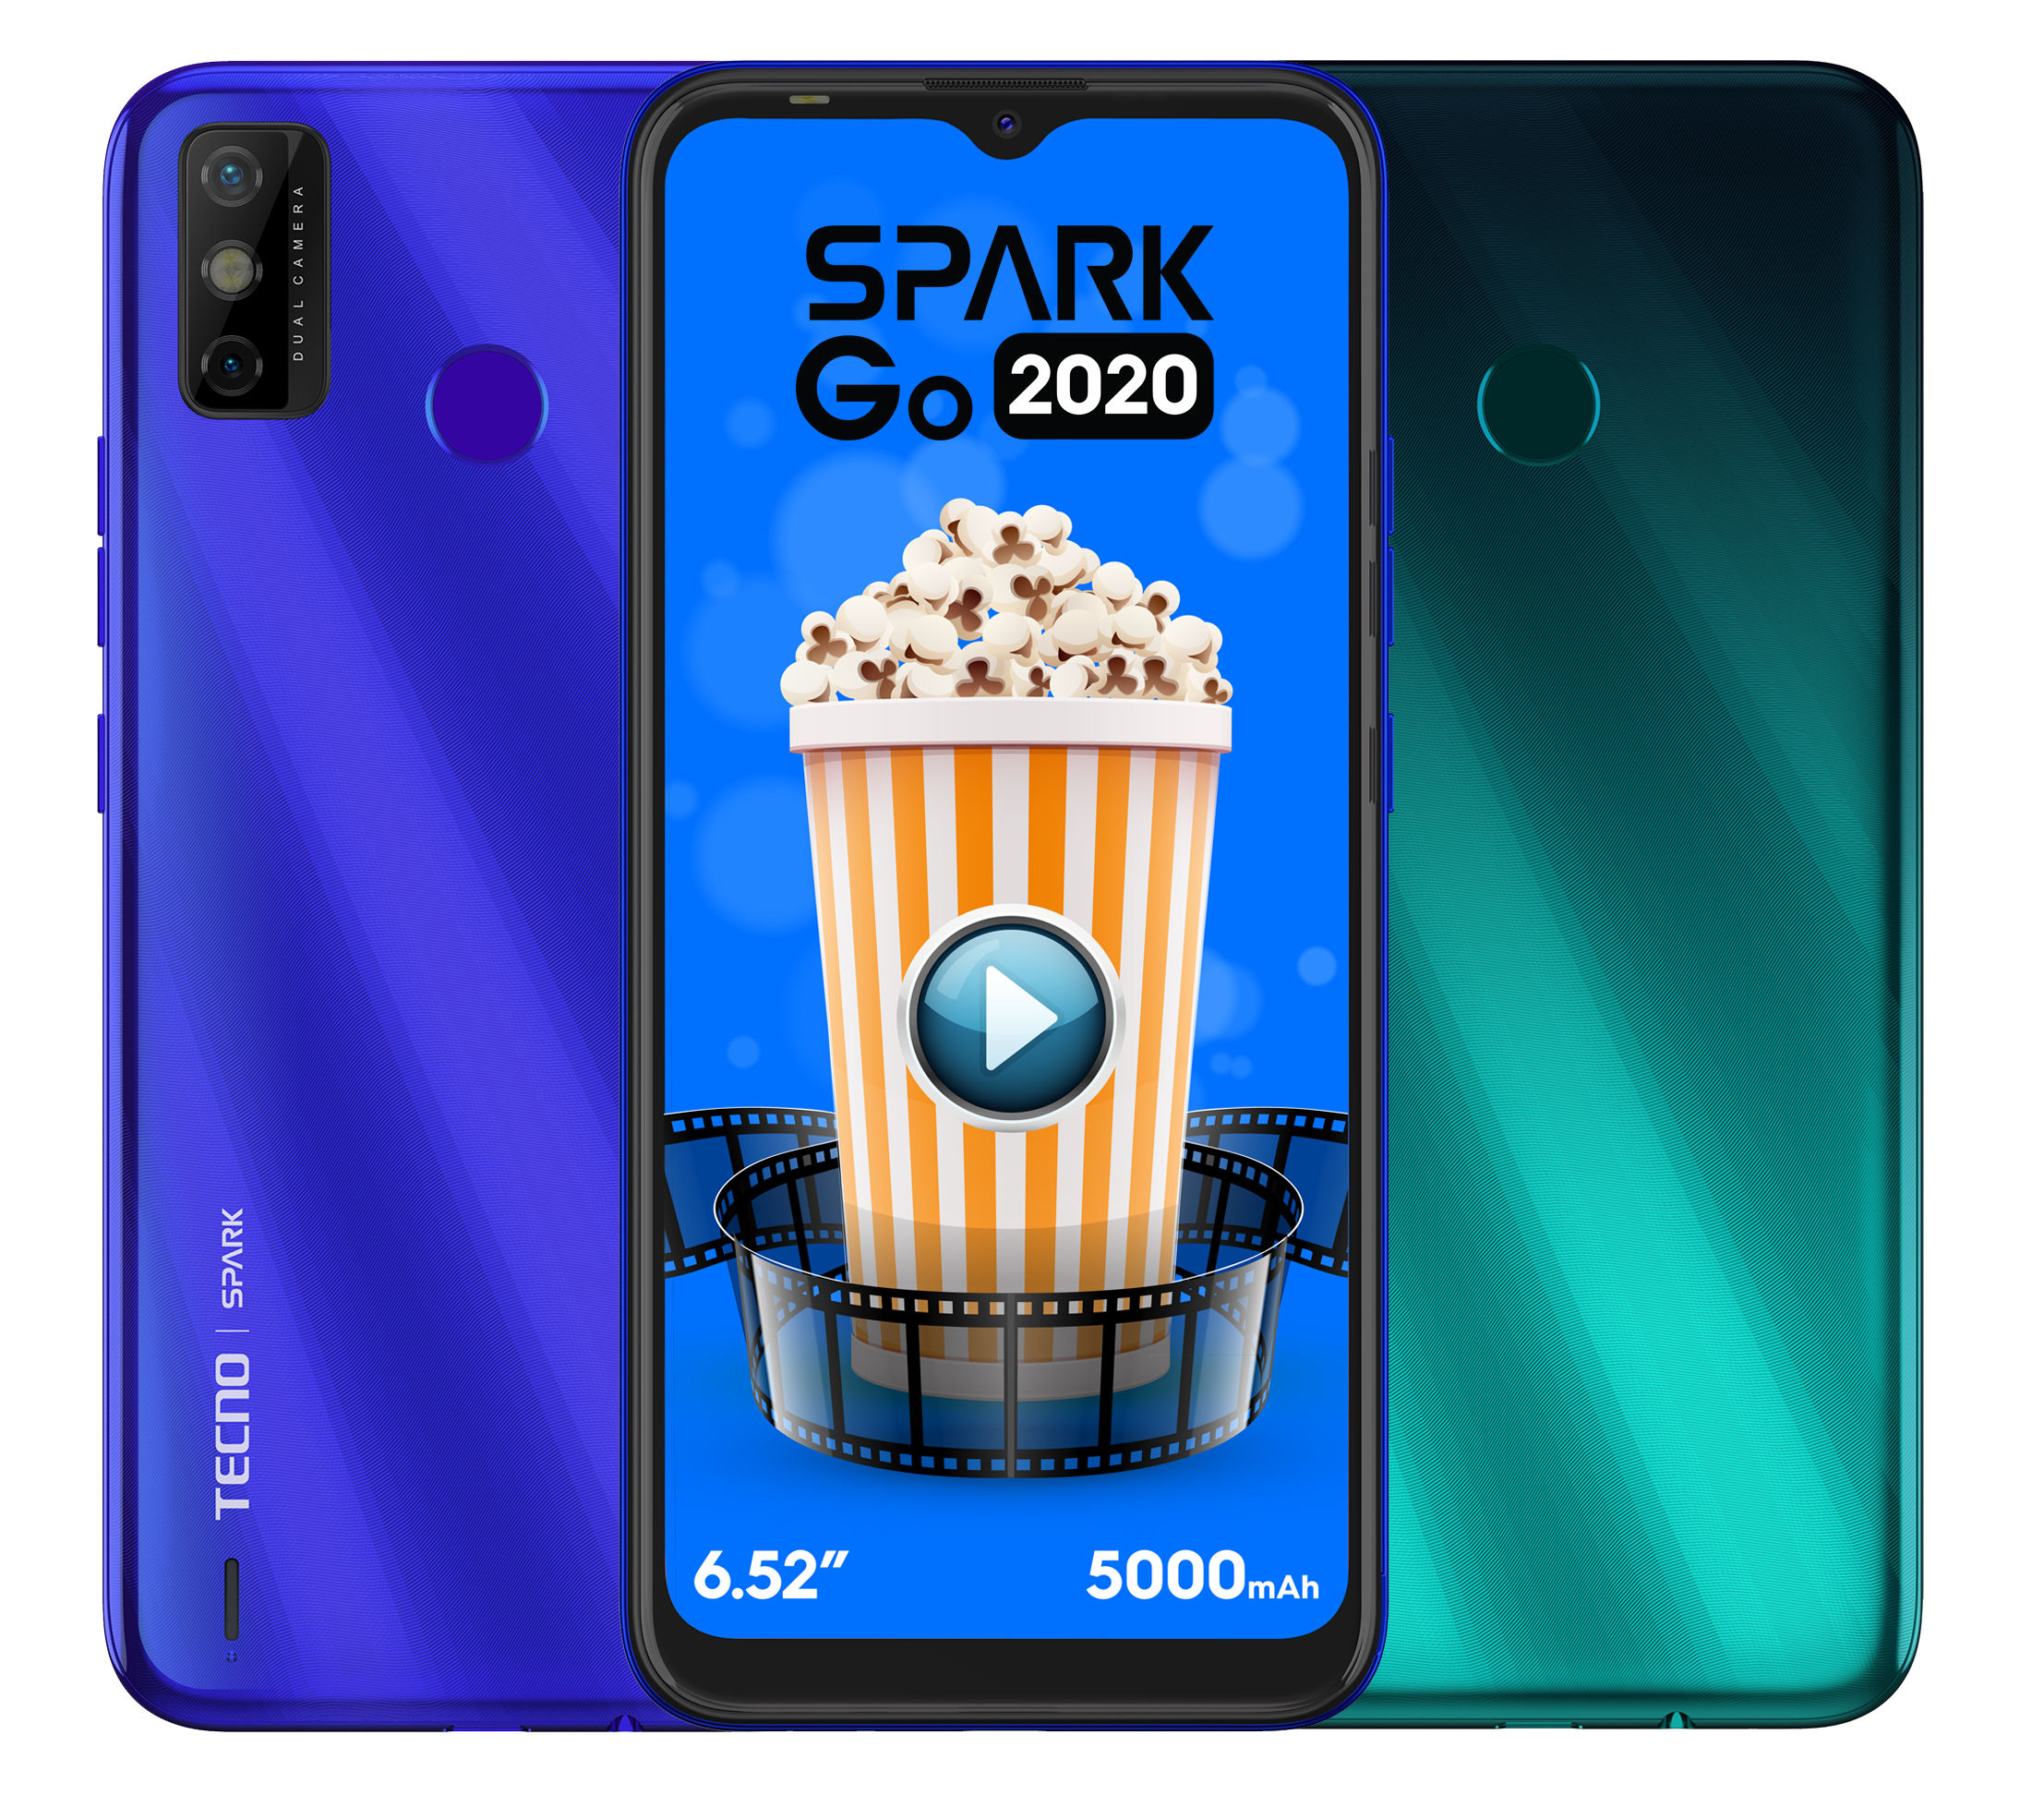 The Tecno Spark Go 2020 comes with the MediaTek Helio A20 and 13MP dual AI cameras